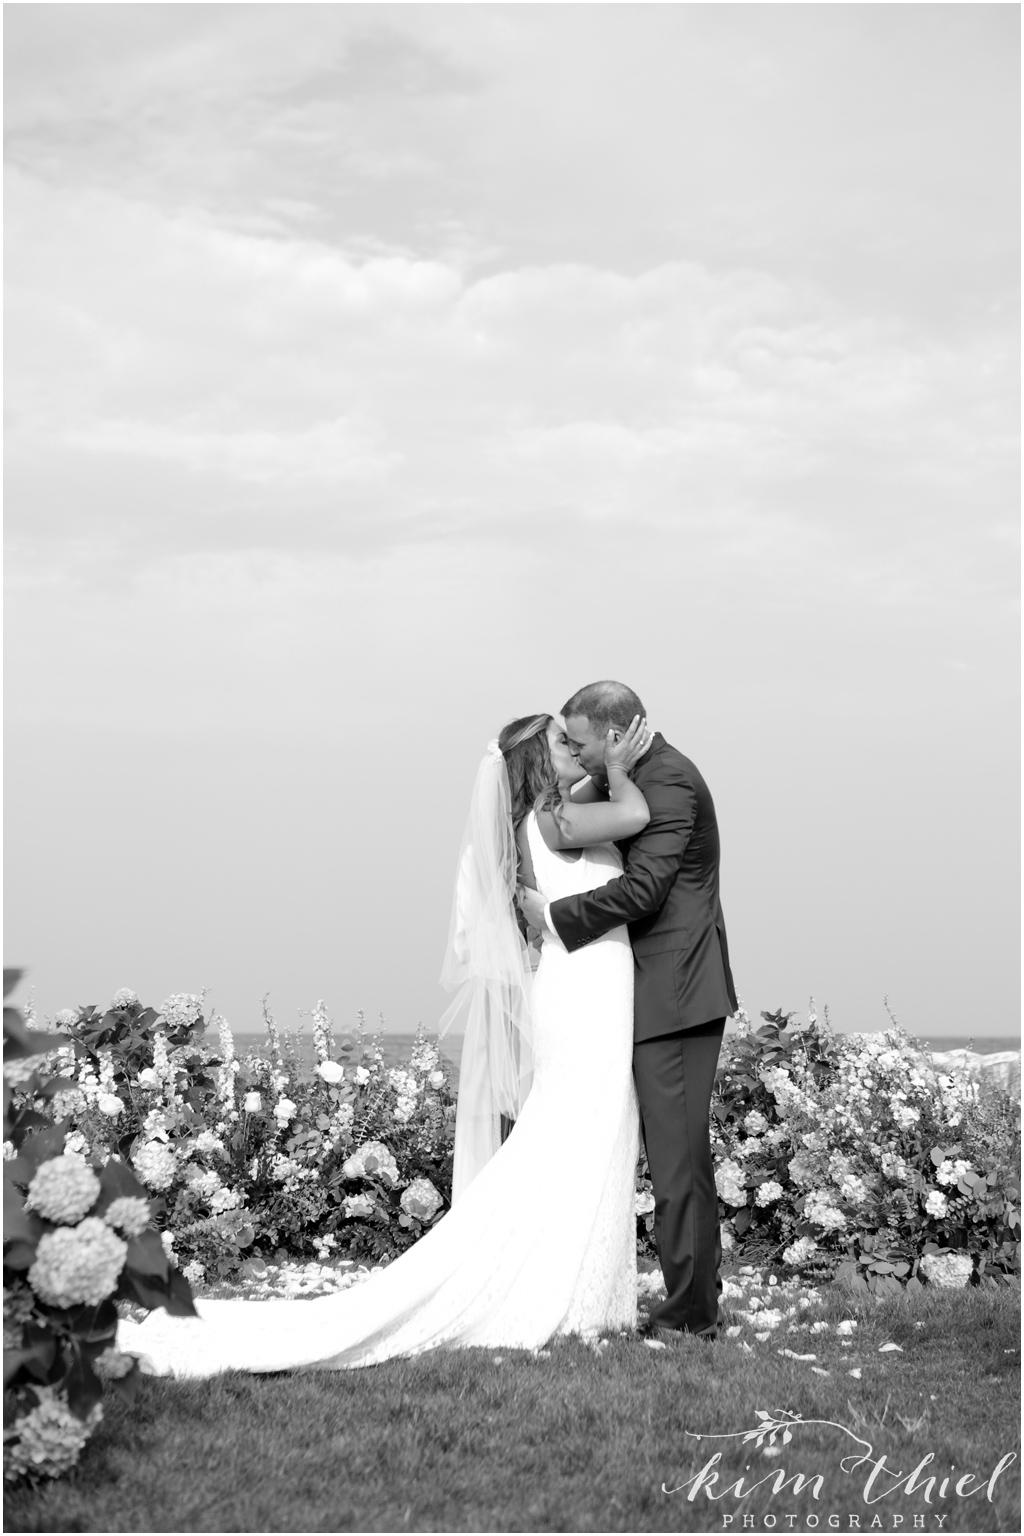 Kim-Thiel-Photography-Door-County-Gordon Lodge-30